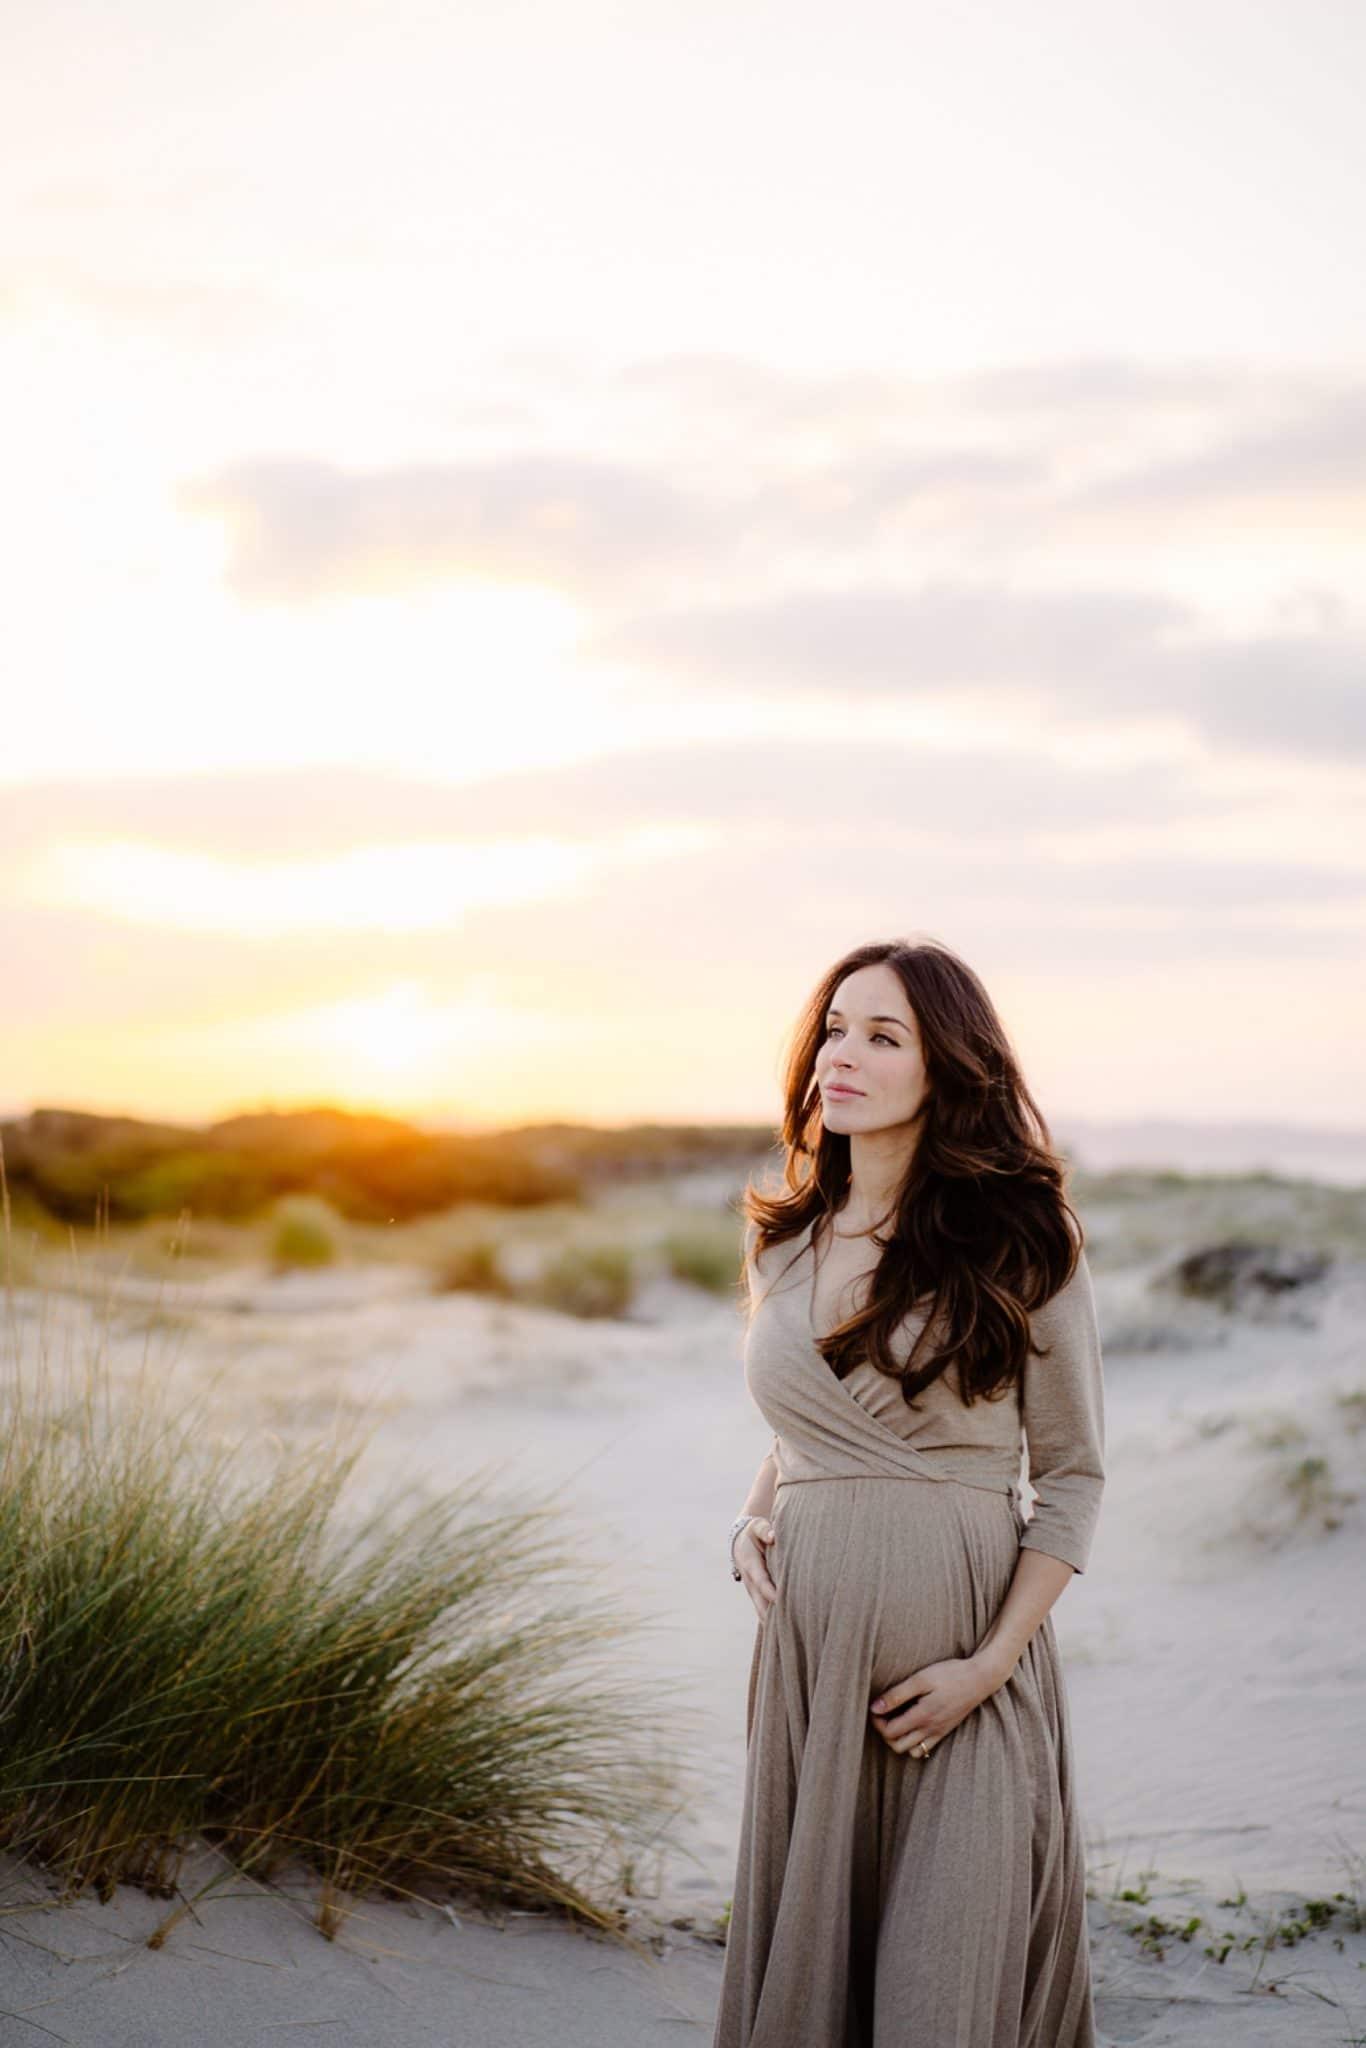 sardinia photo on the beach